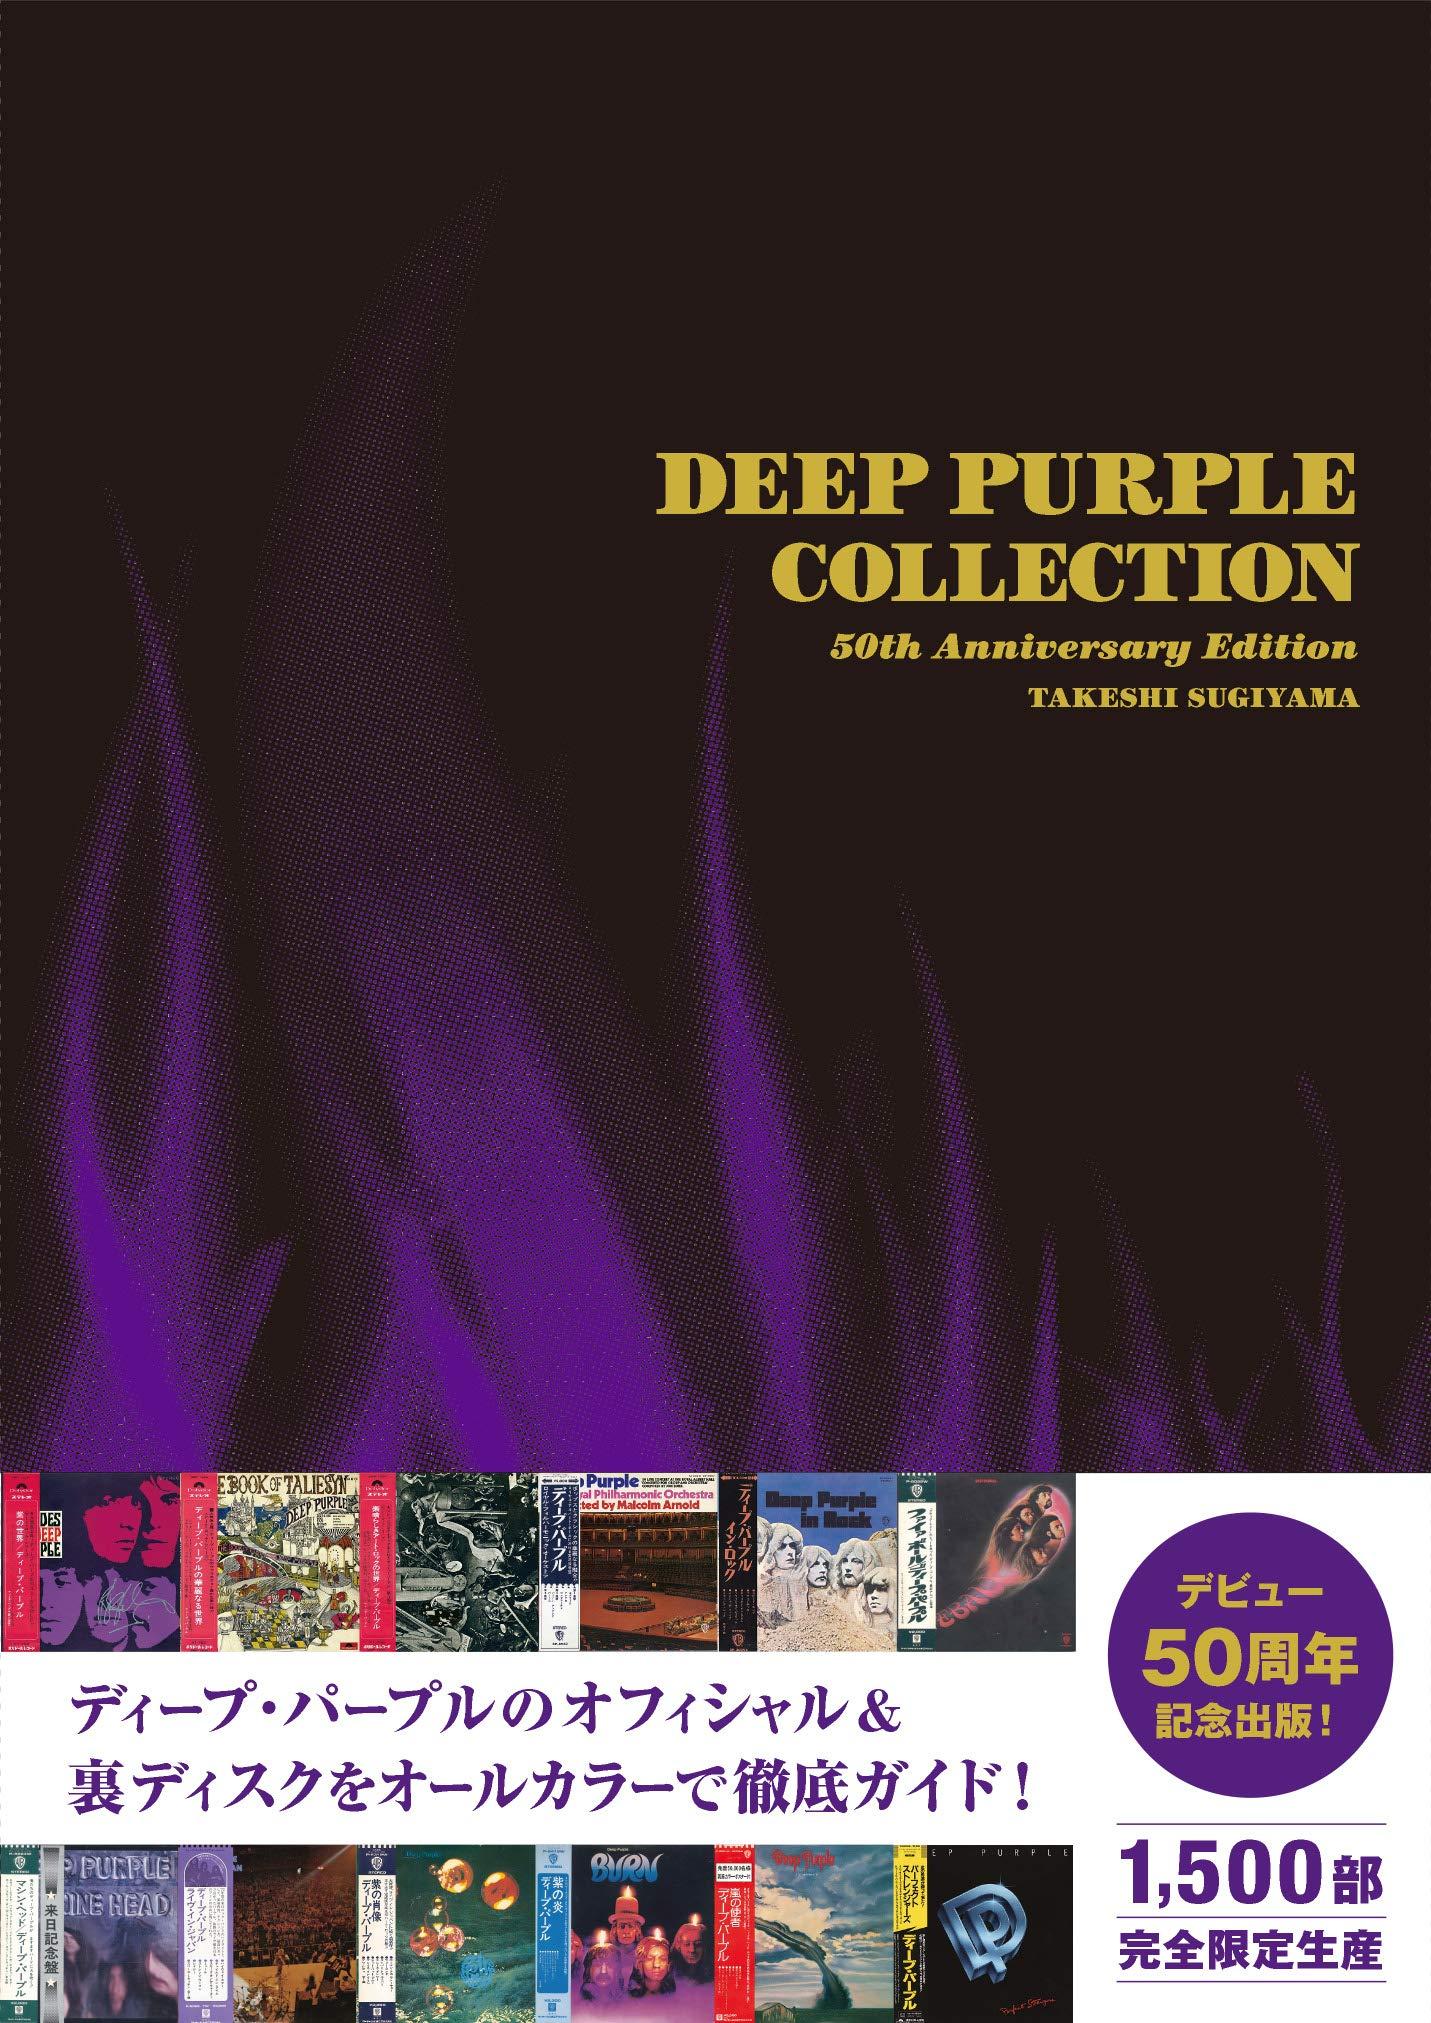 CD /DVD /Blu-ray/ LP achats - Page 10 81zSB%2Bwus%2BL